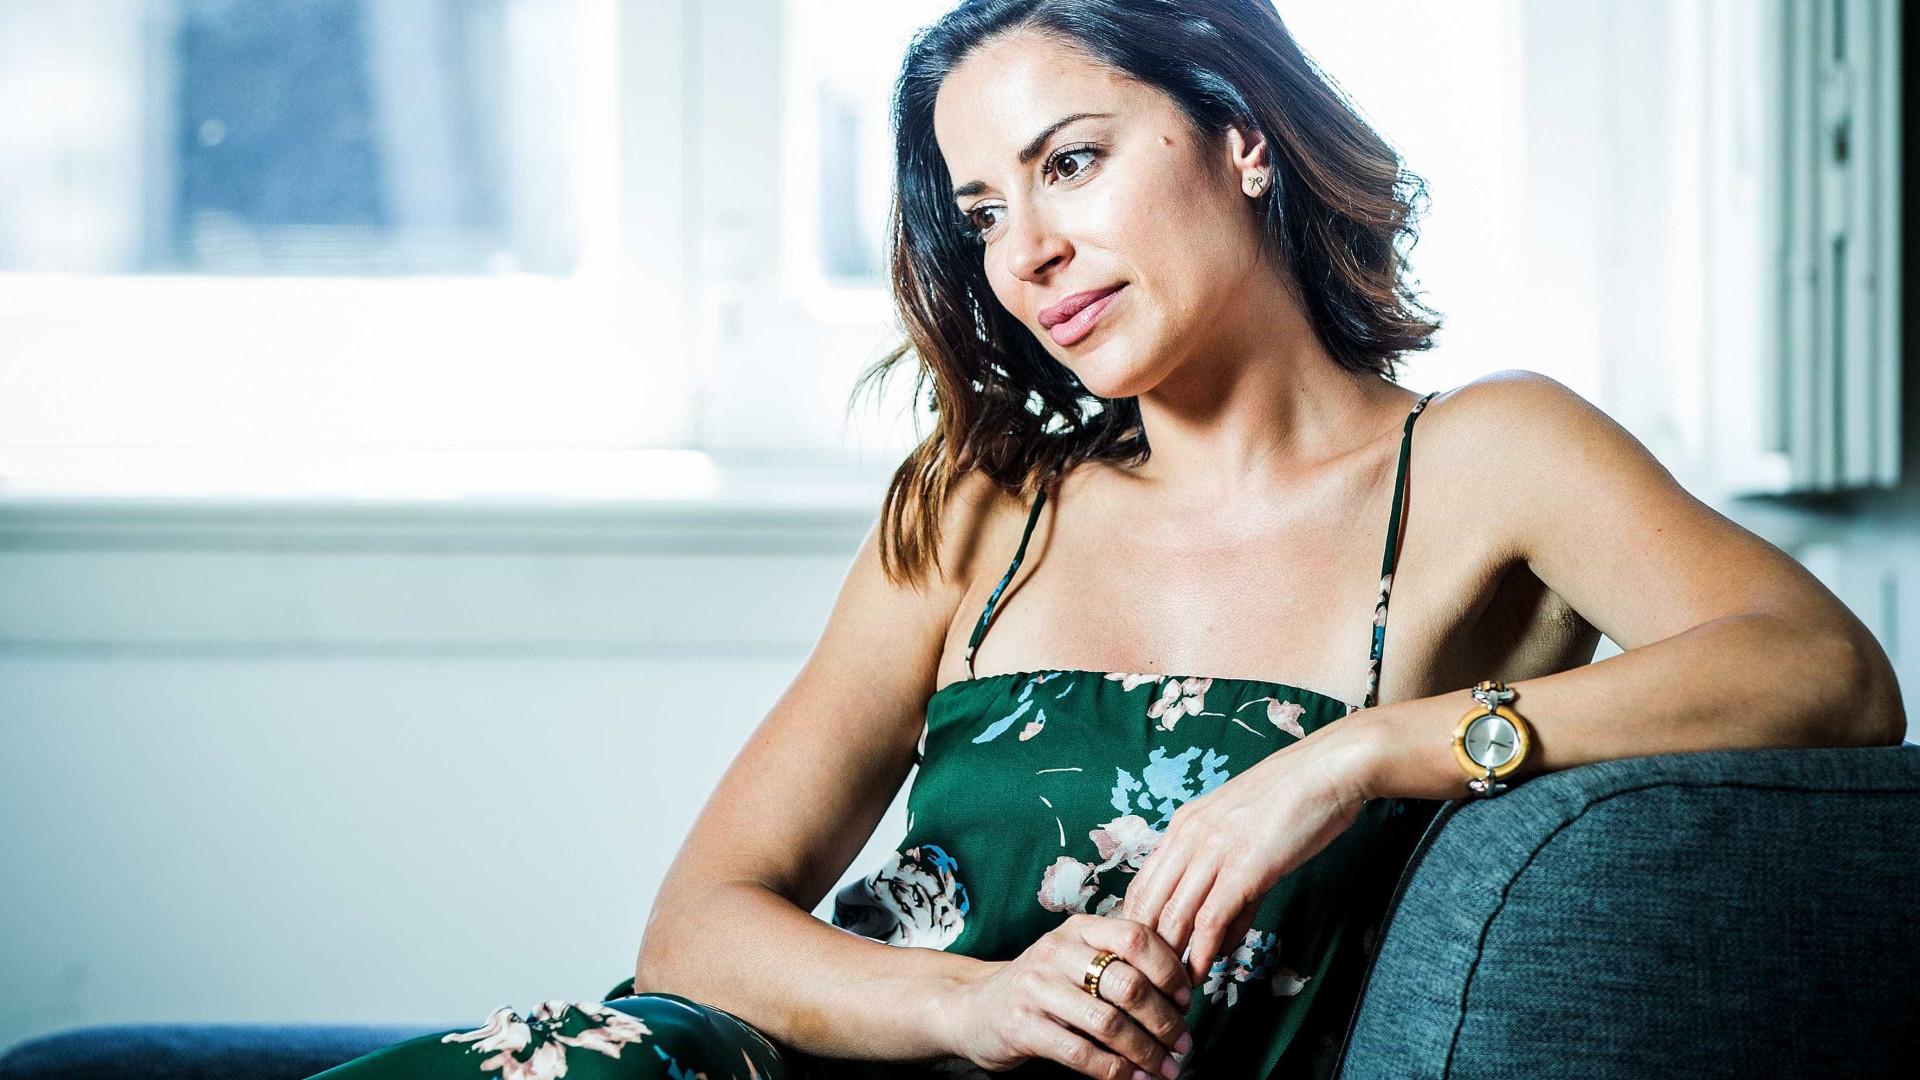 Dania Neto nudes (19 photos), foto Ass, YouTube, panties 2019